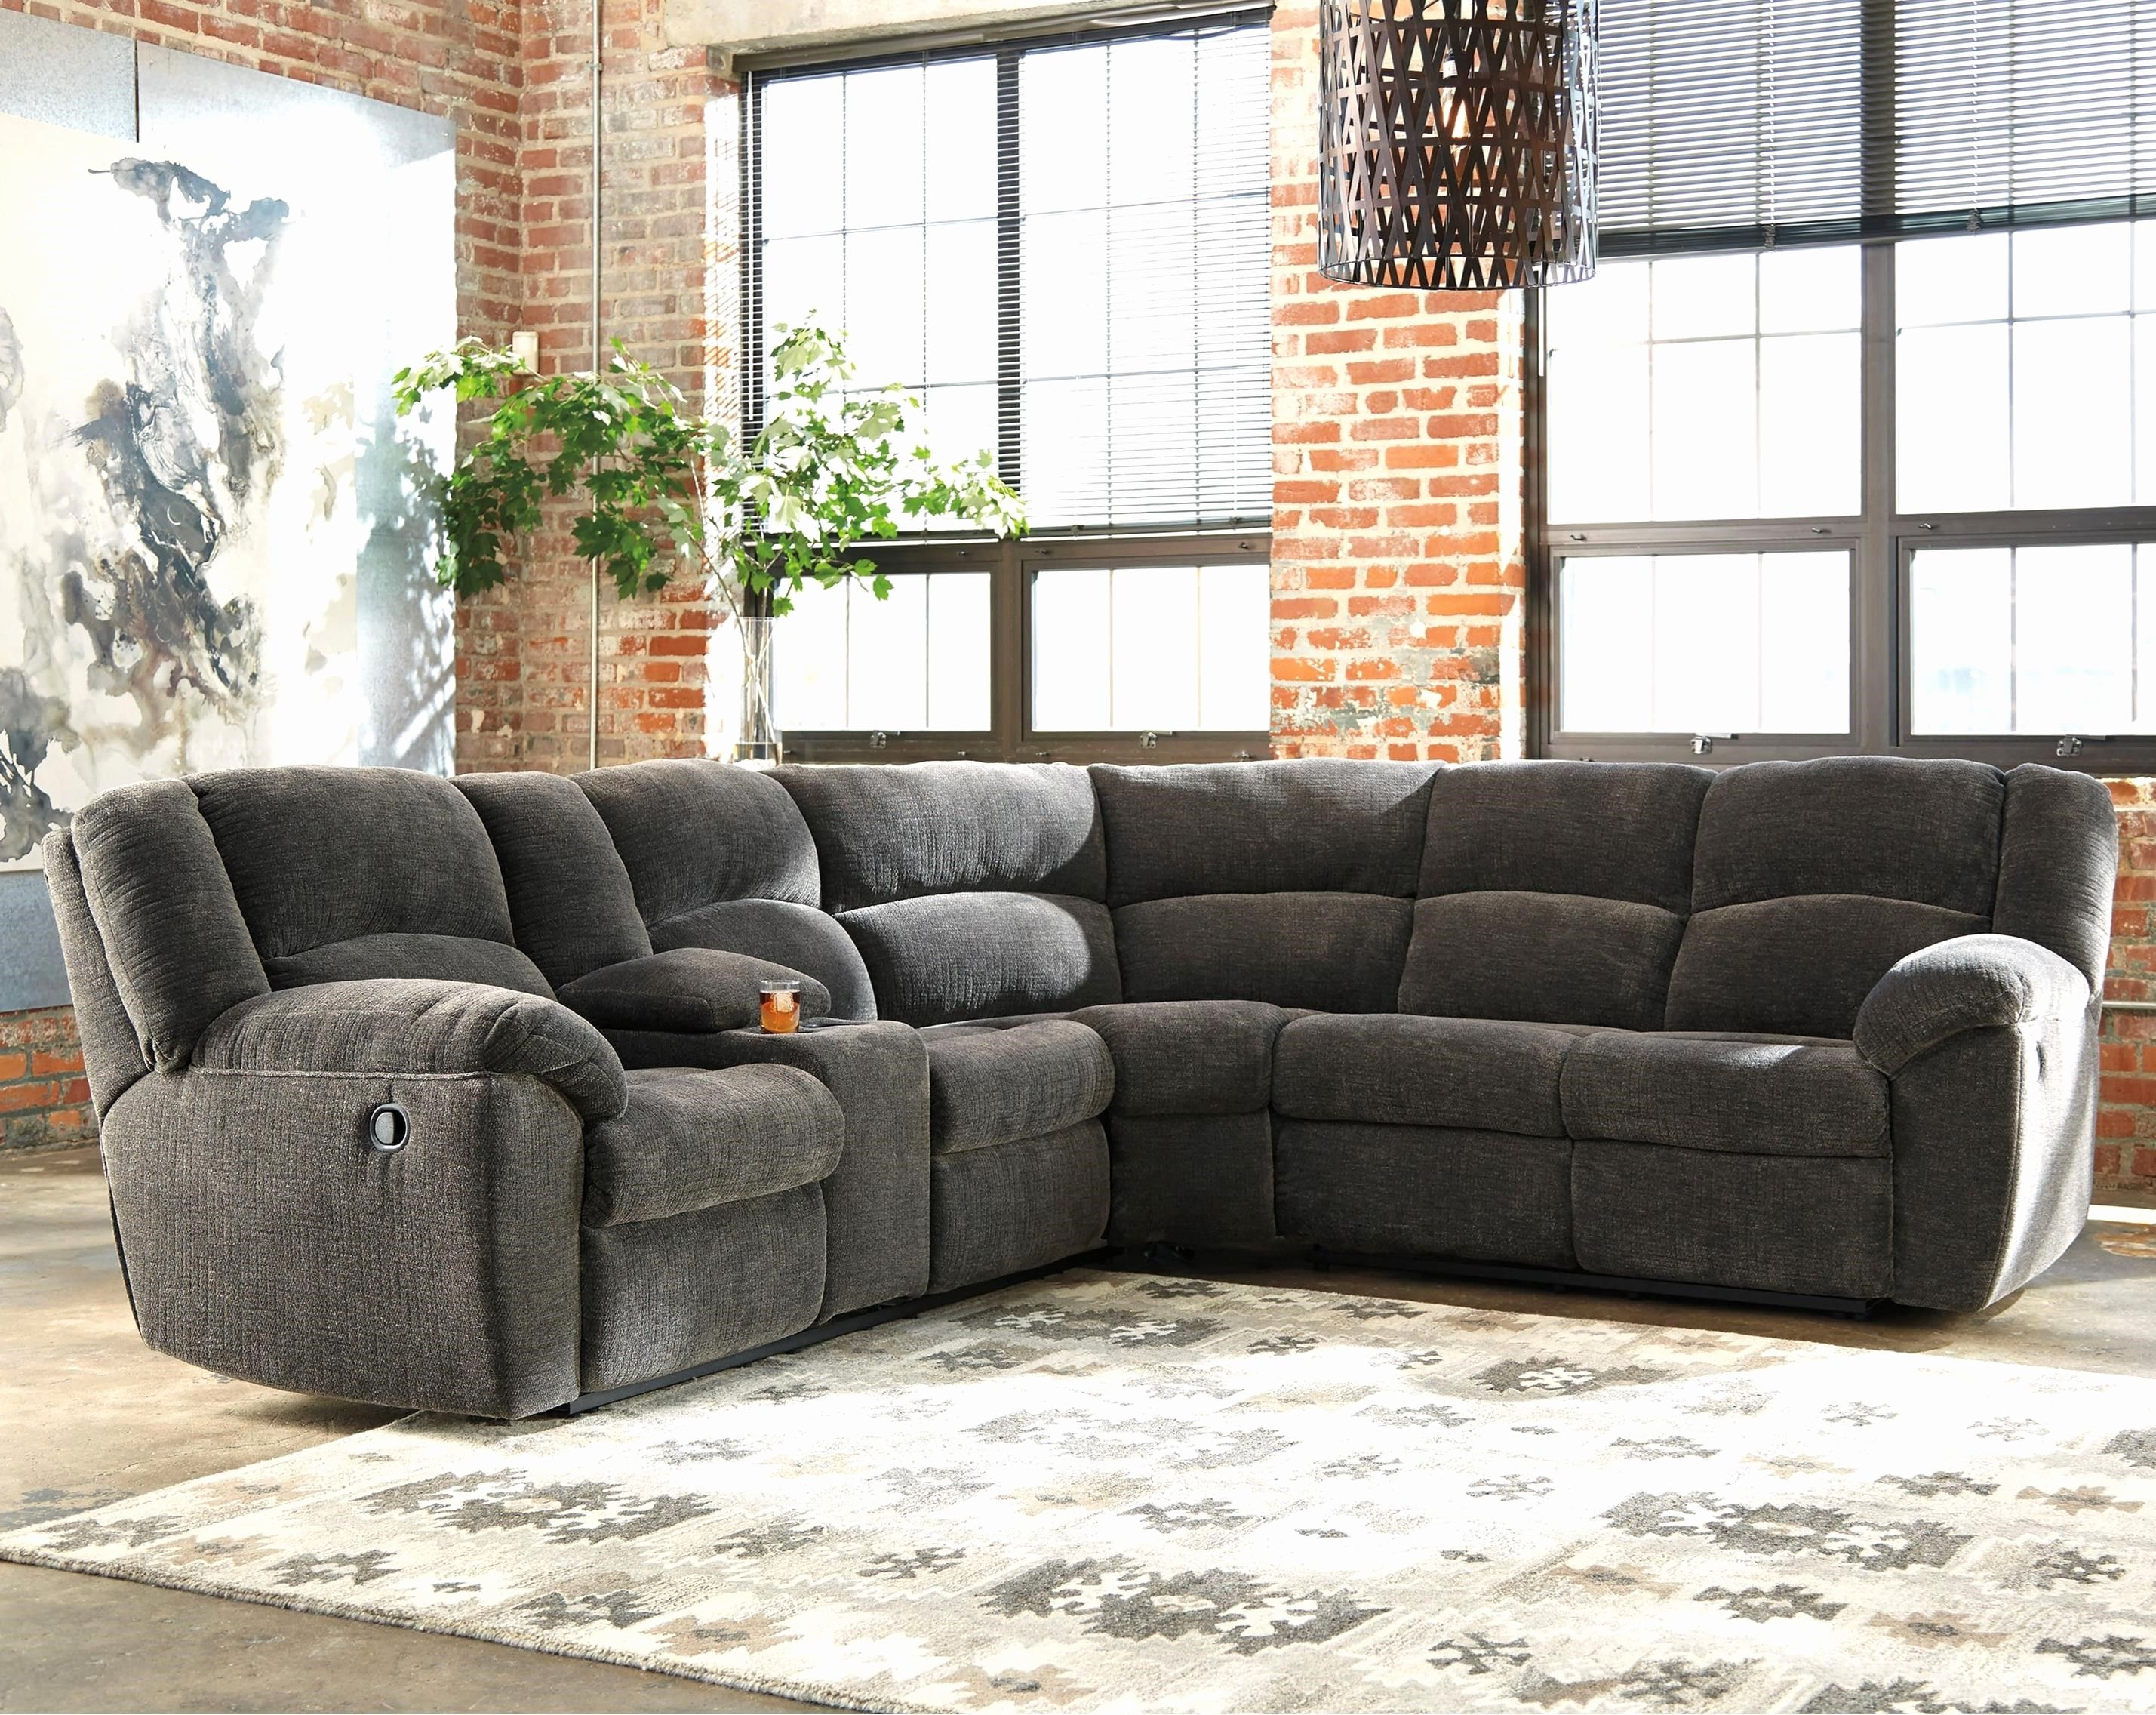 Luxury Microfiber Cleaner For Sofa Microfiber Cleaner For Sofa